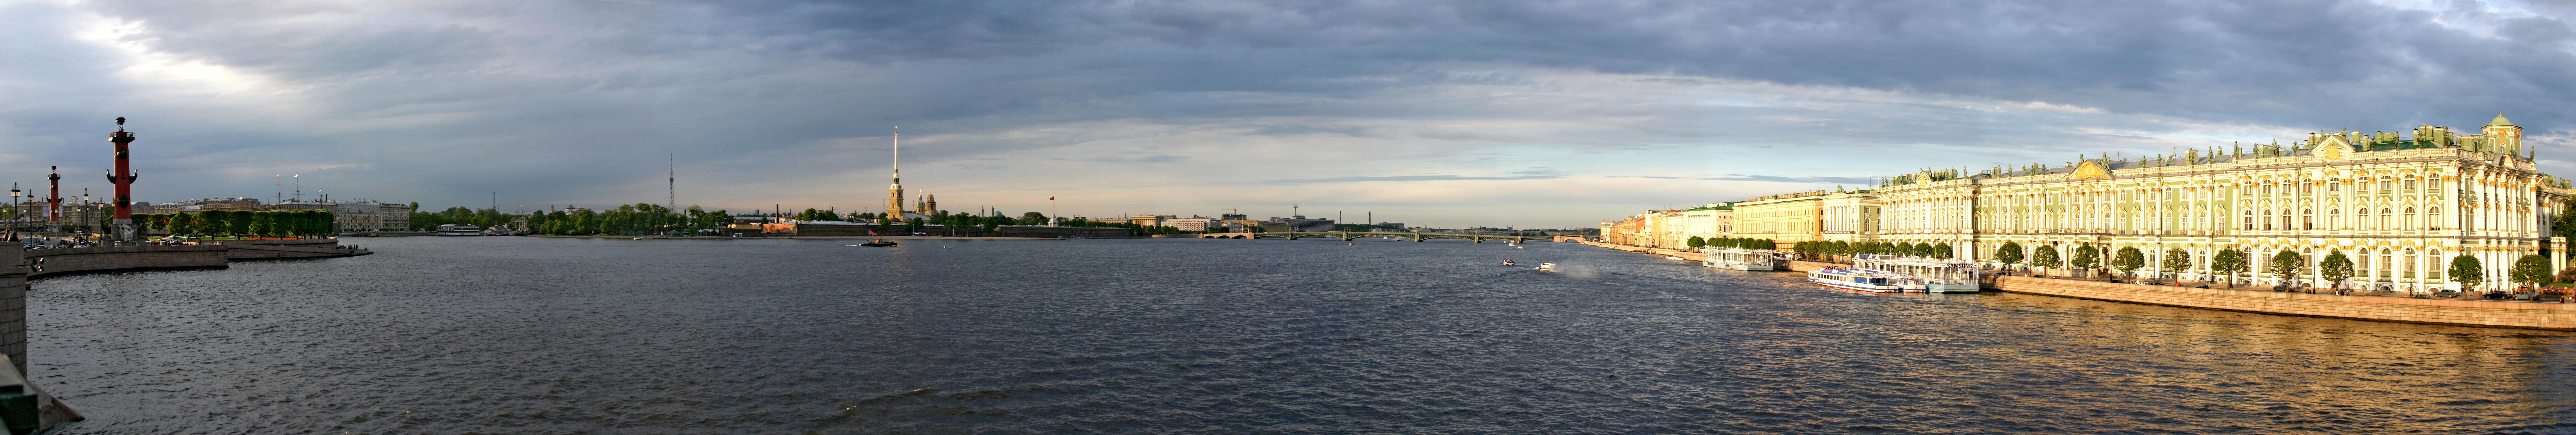 Панорама Санкт-Петербурга с Дворцового моста.